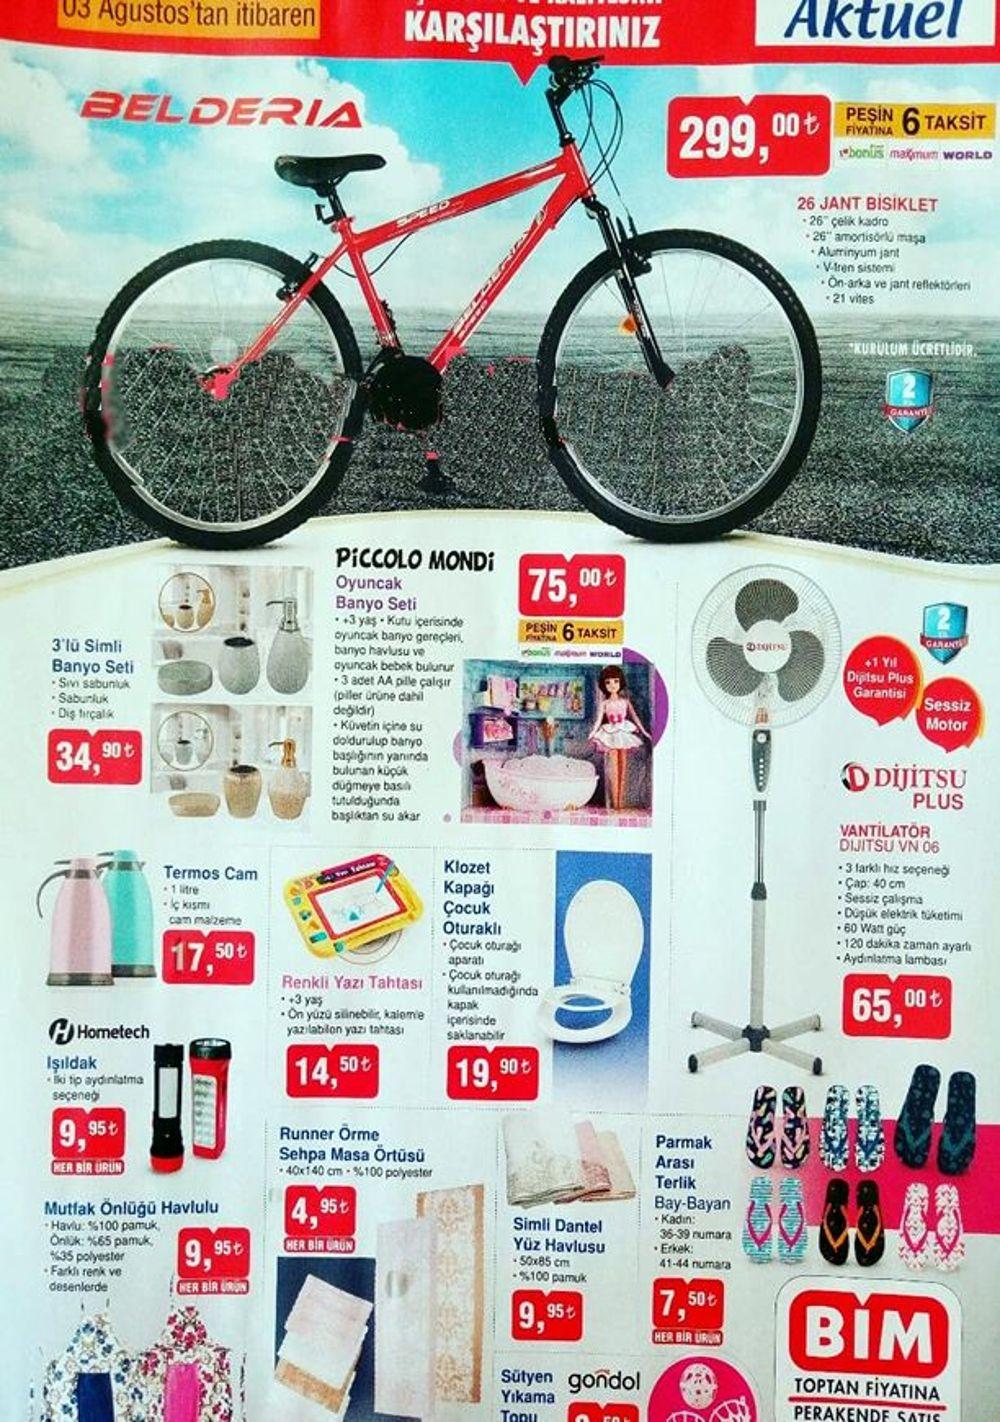 3 agustos 2018 bim aktuel urunler katalogu bisiklet